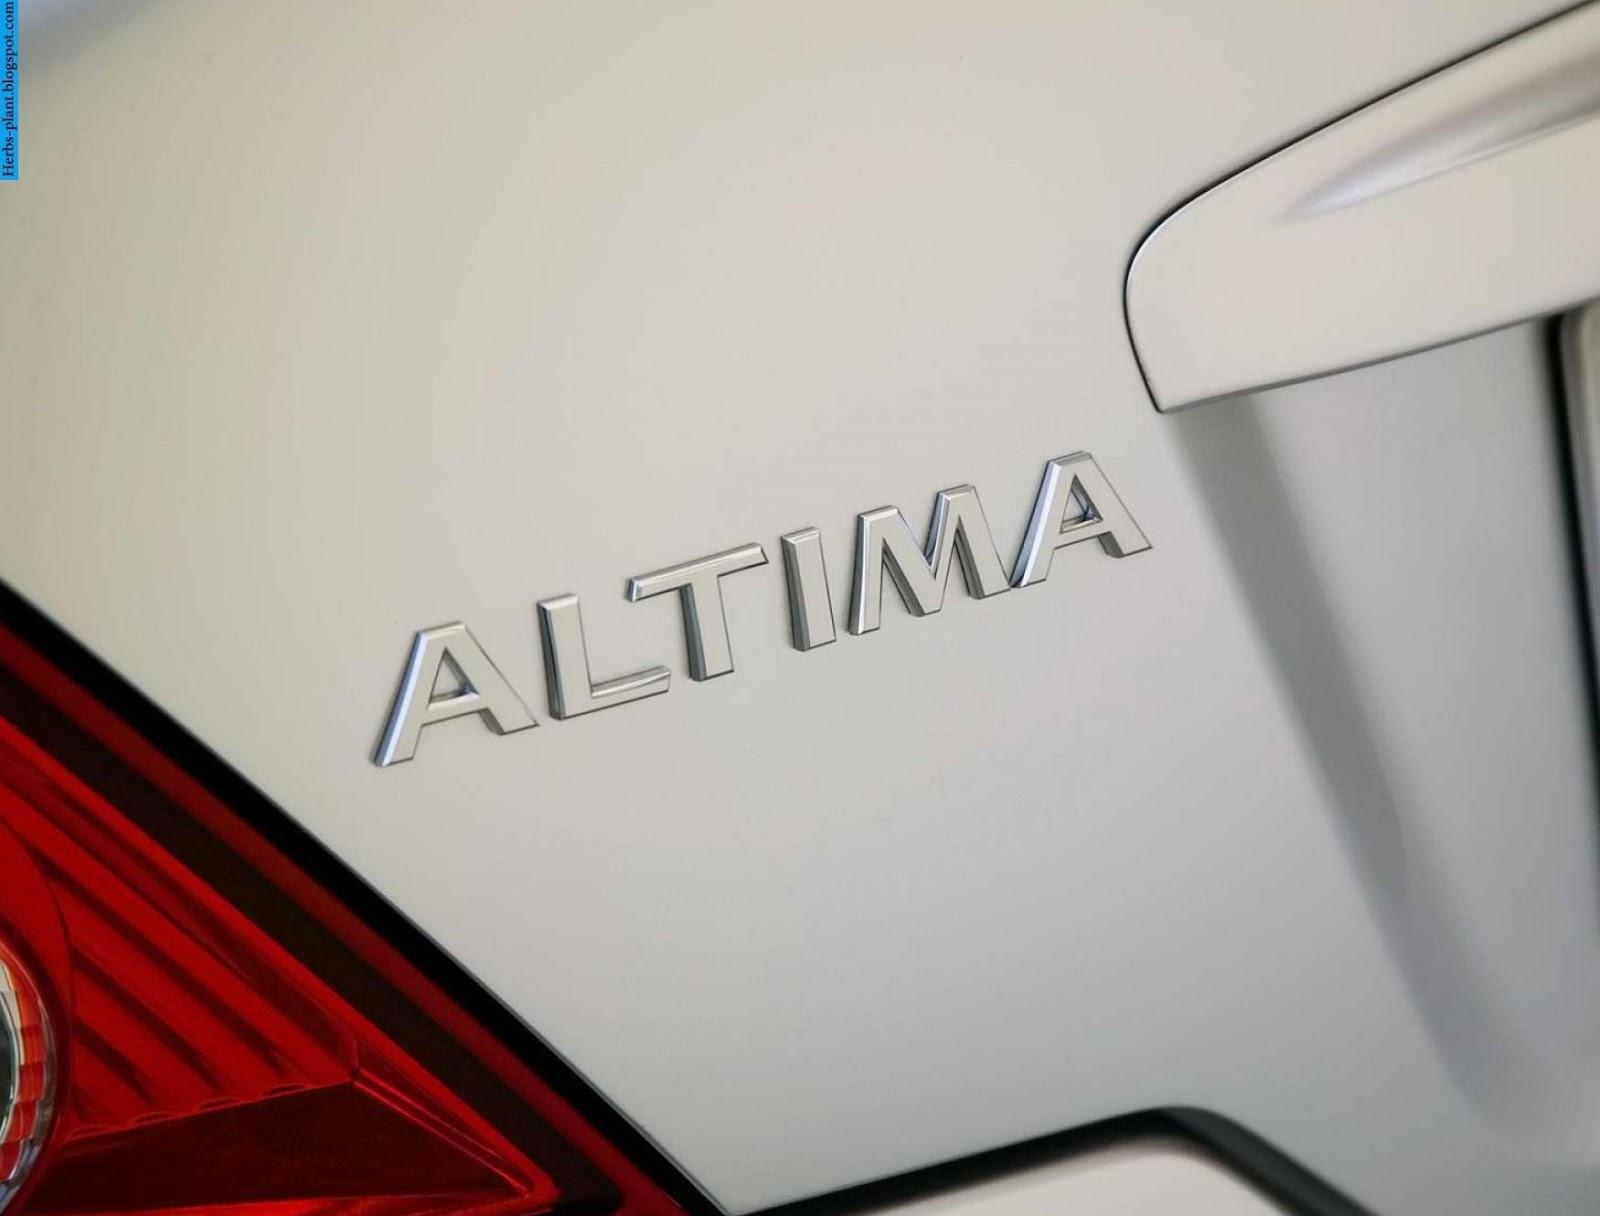 Nissan altima car 2013 logo - صور شعار سيارة نيسان التيما 2013